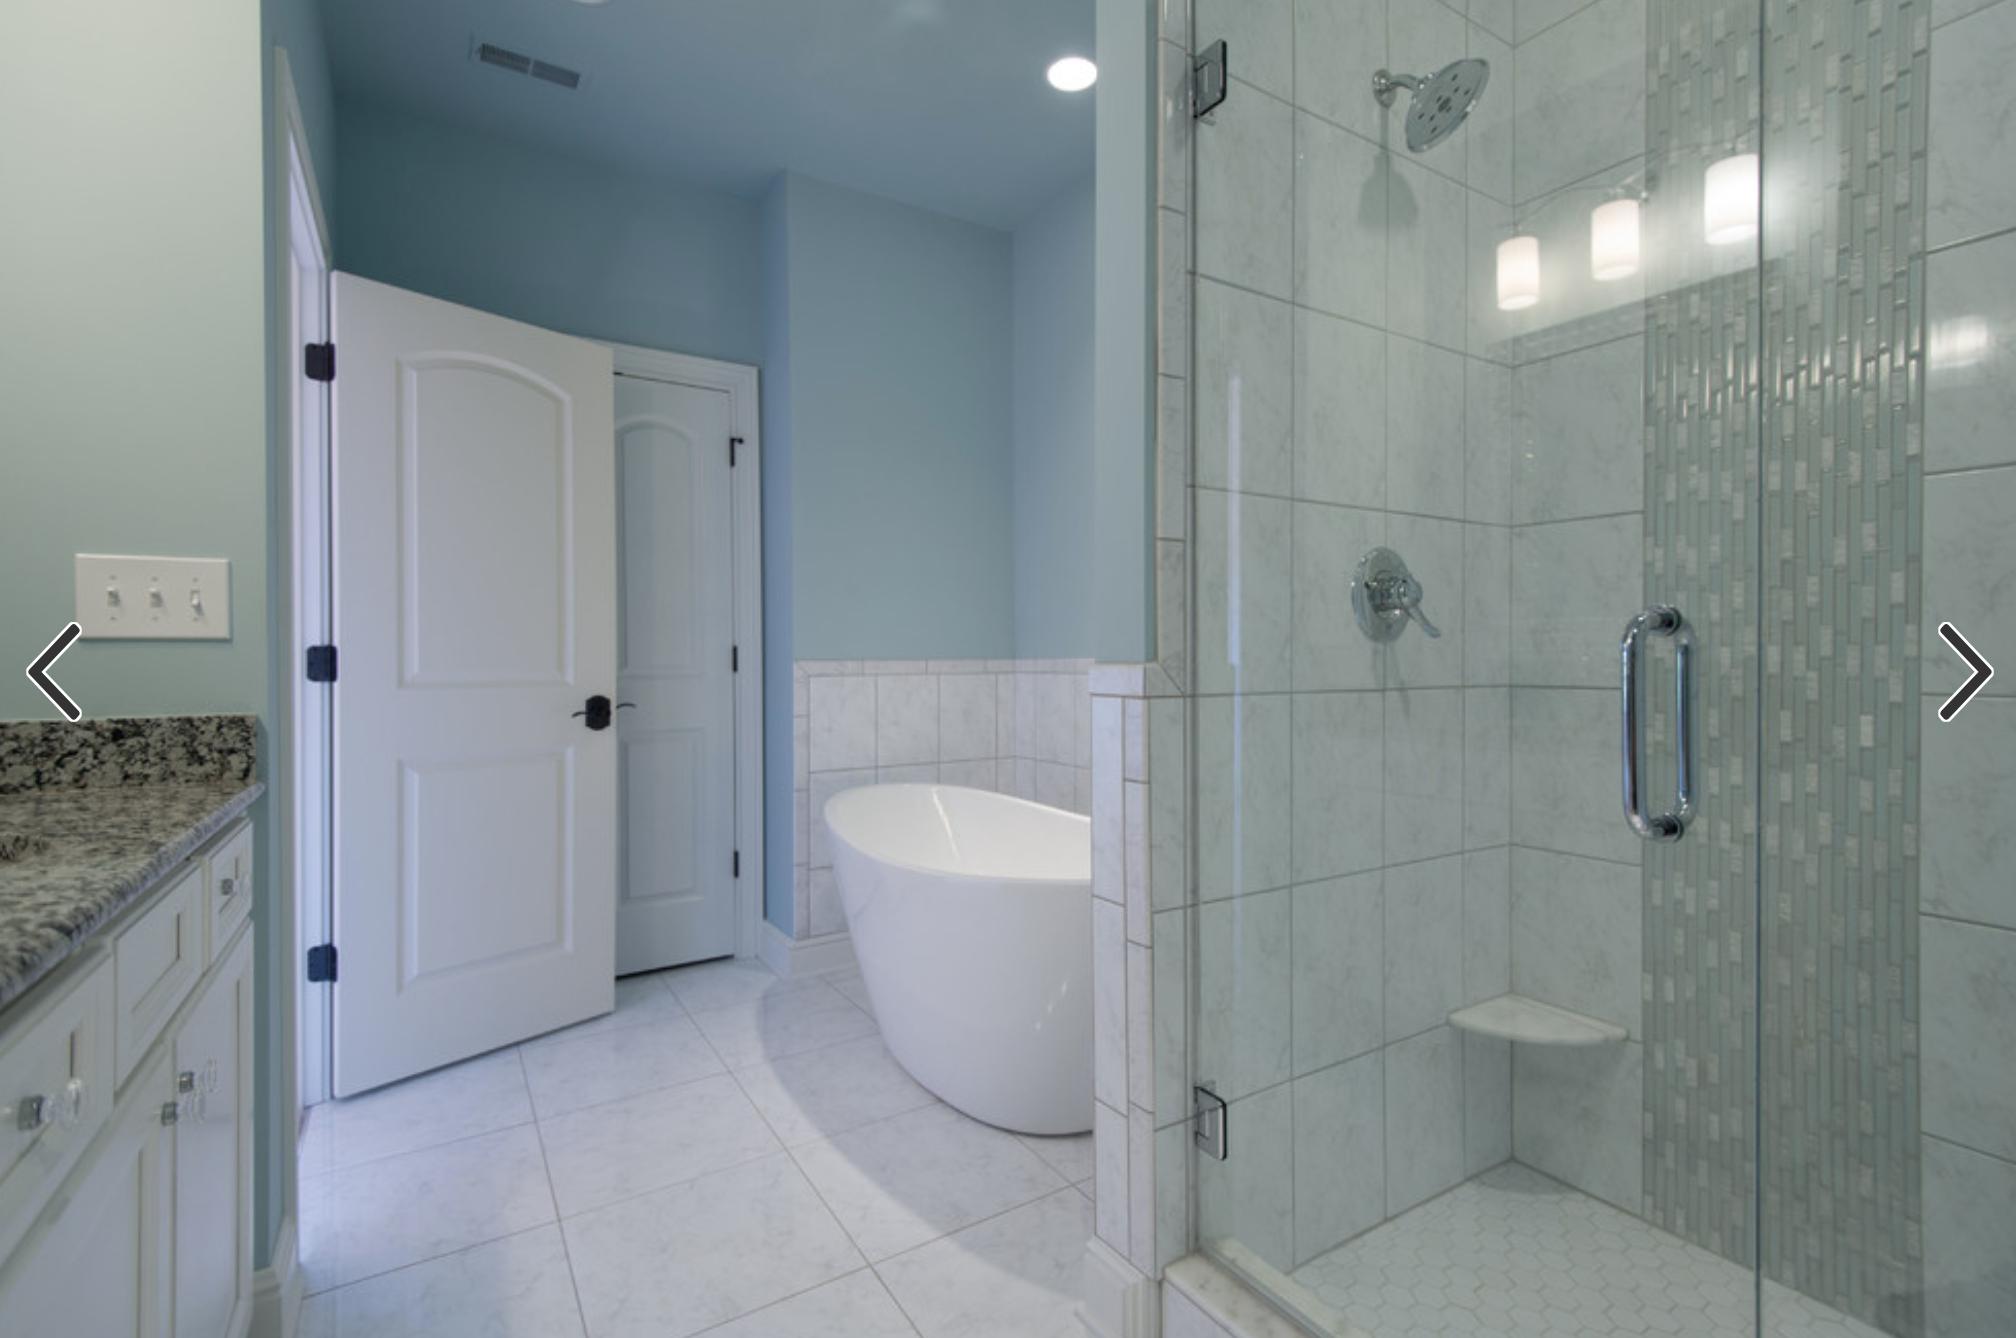 Houzz | Same large tile on shower wall and bathroom floor. Tile ...